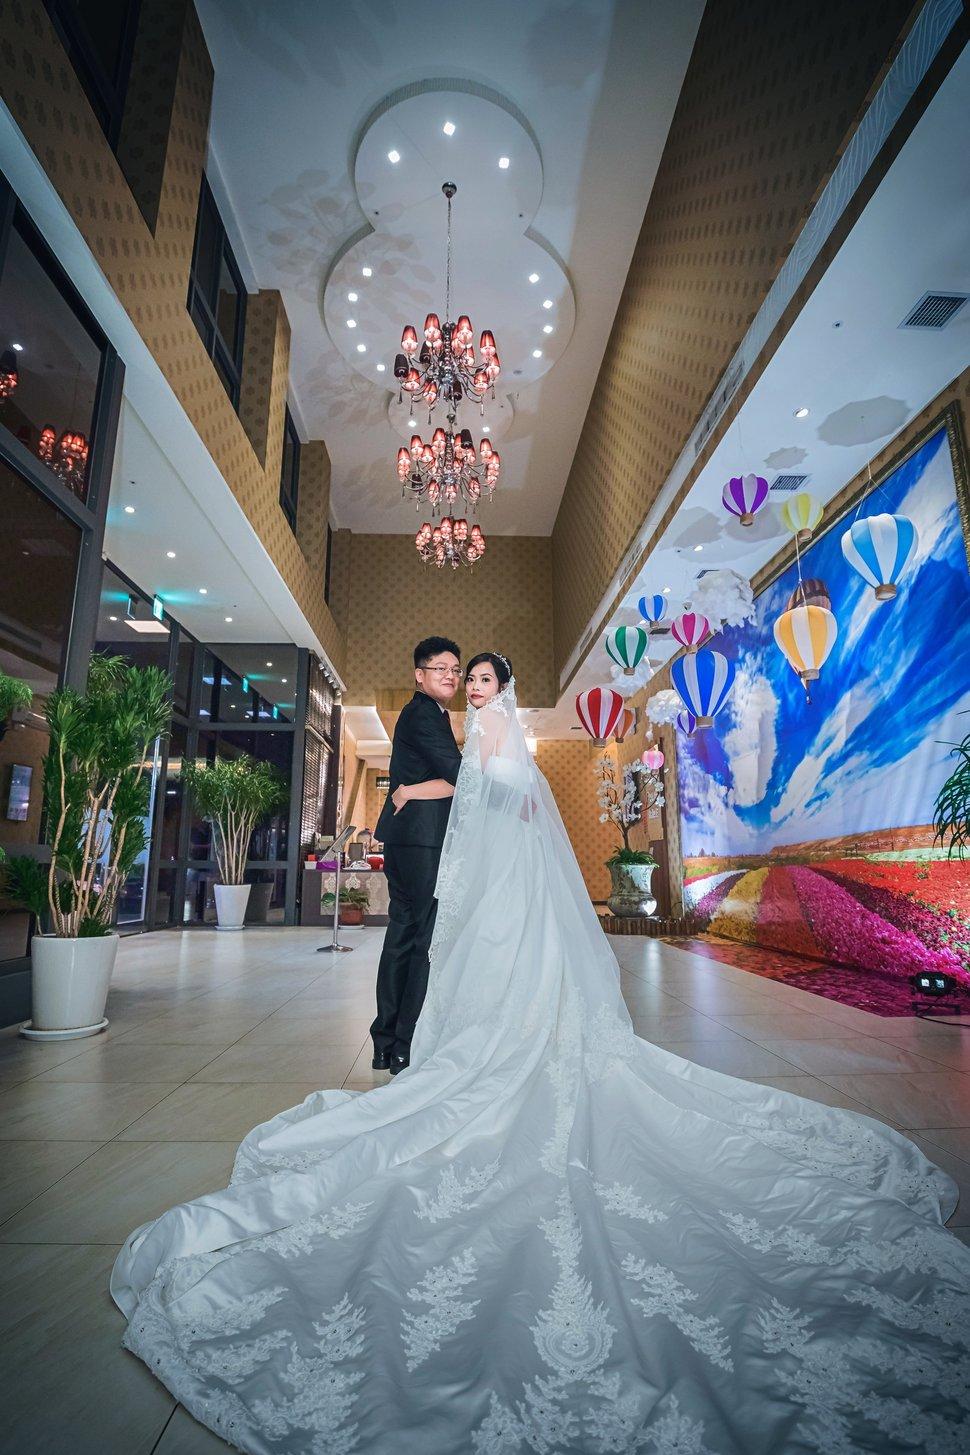 5D4_0430 - Promaker婚禮紀錄攝影團隊婚攝豪哥《結婚吧》